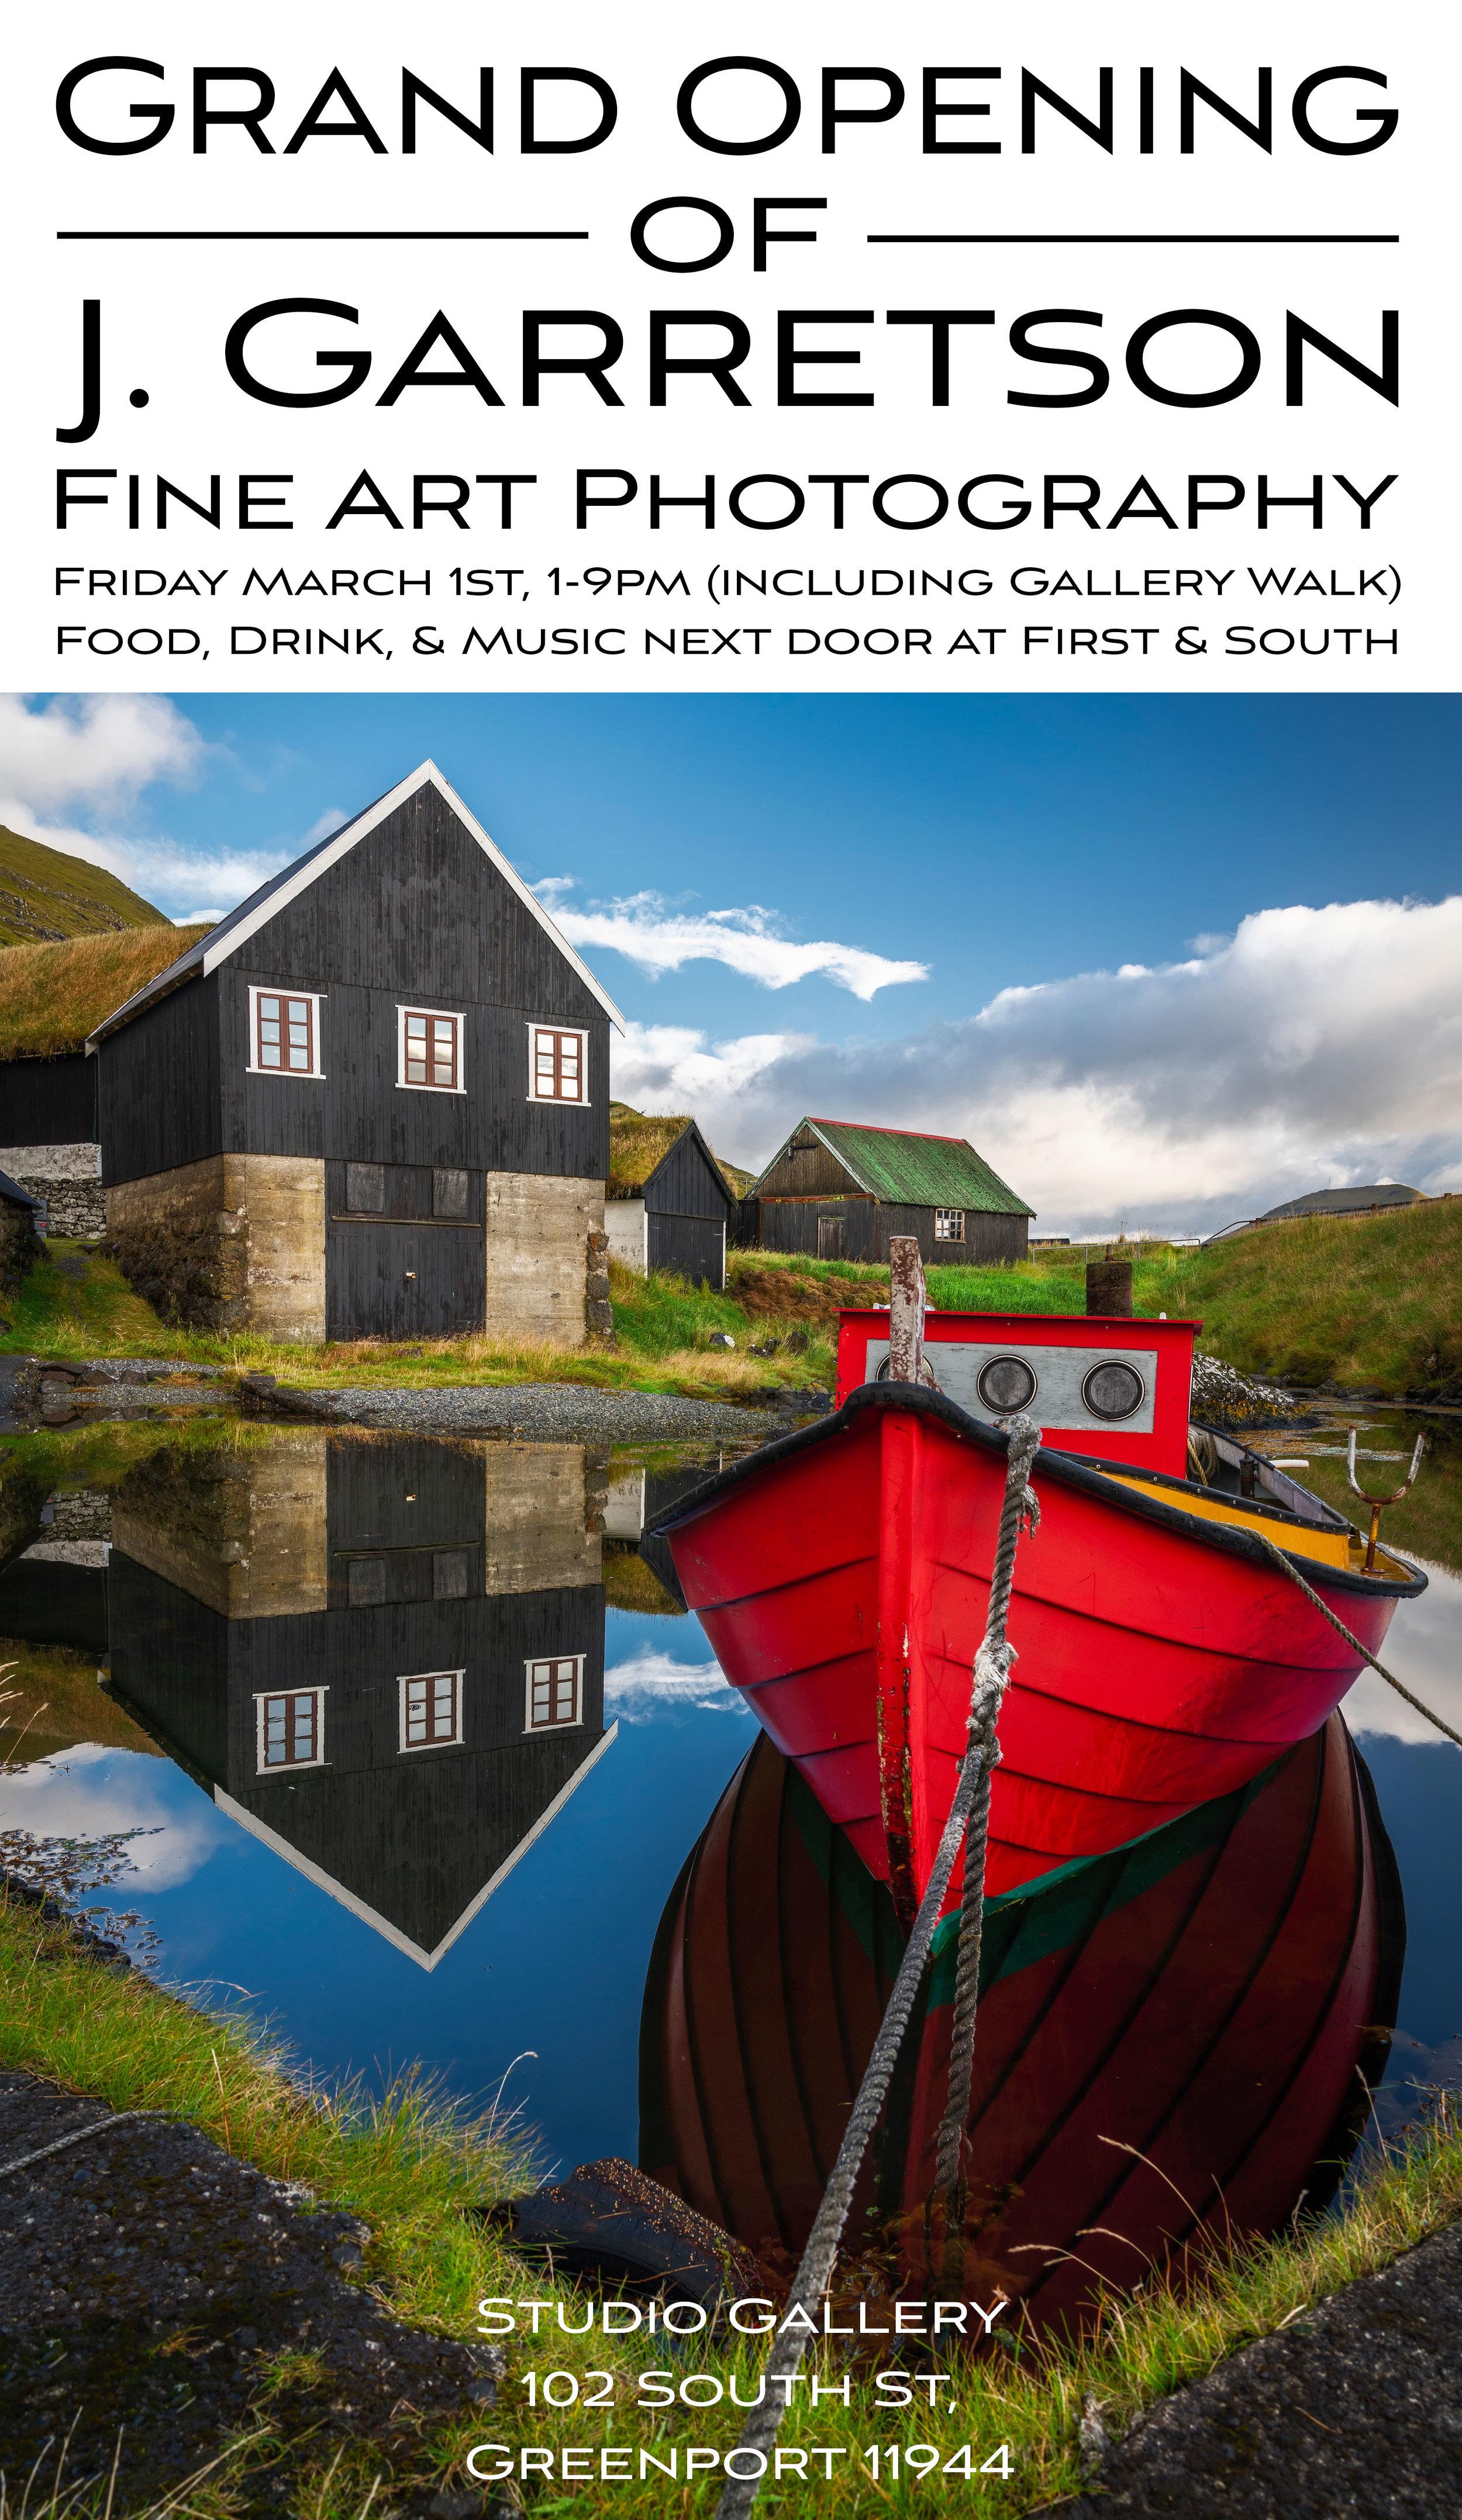 Faroe-Island-Fishing-Village-Opening.jpg